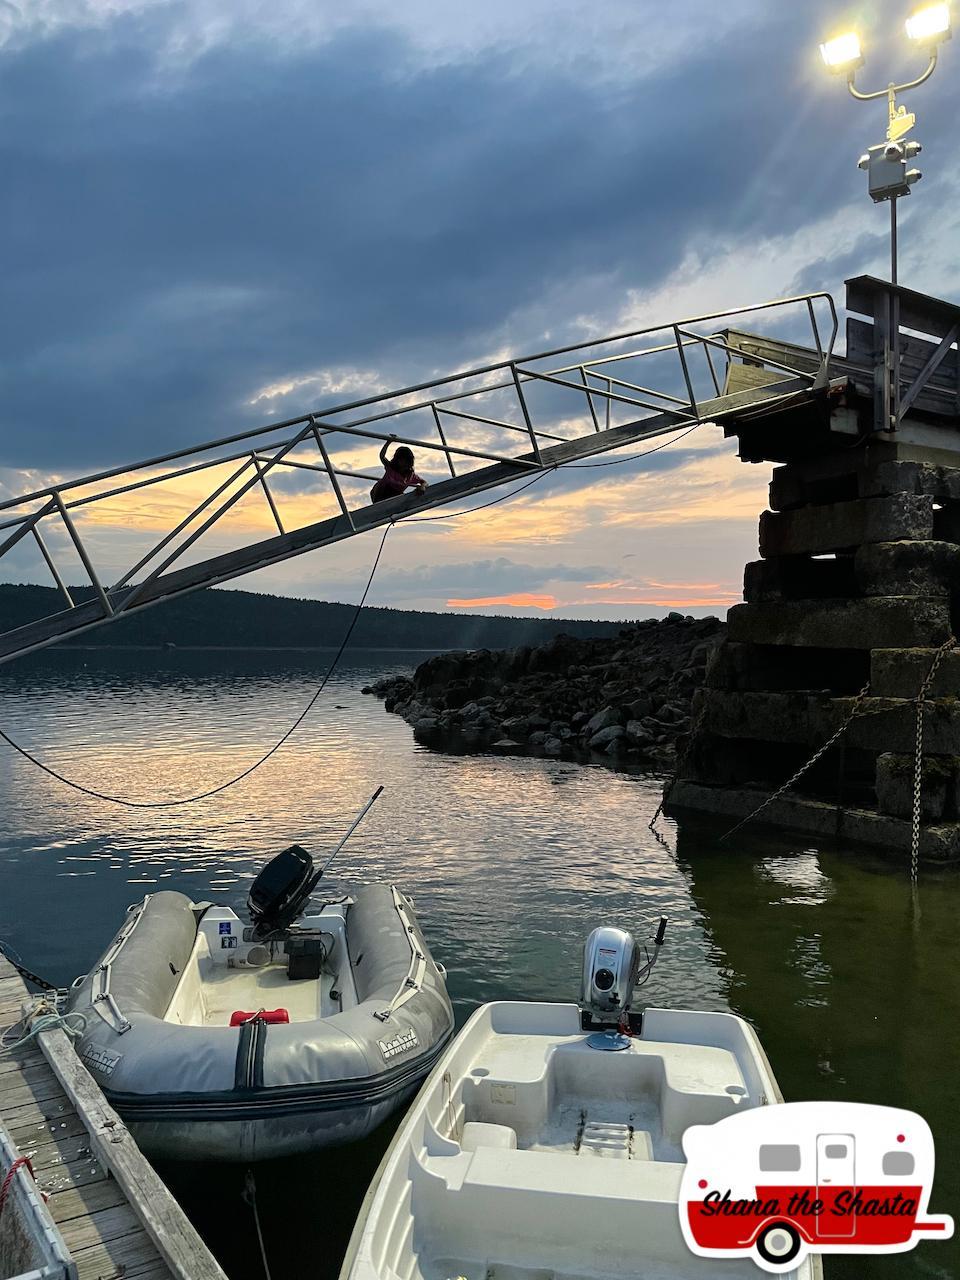 Steep-Dock-Ramp-at-Low-Tide-in-Acadia